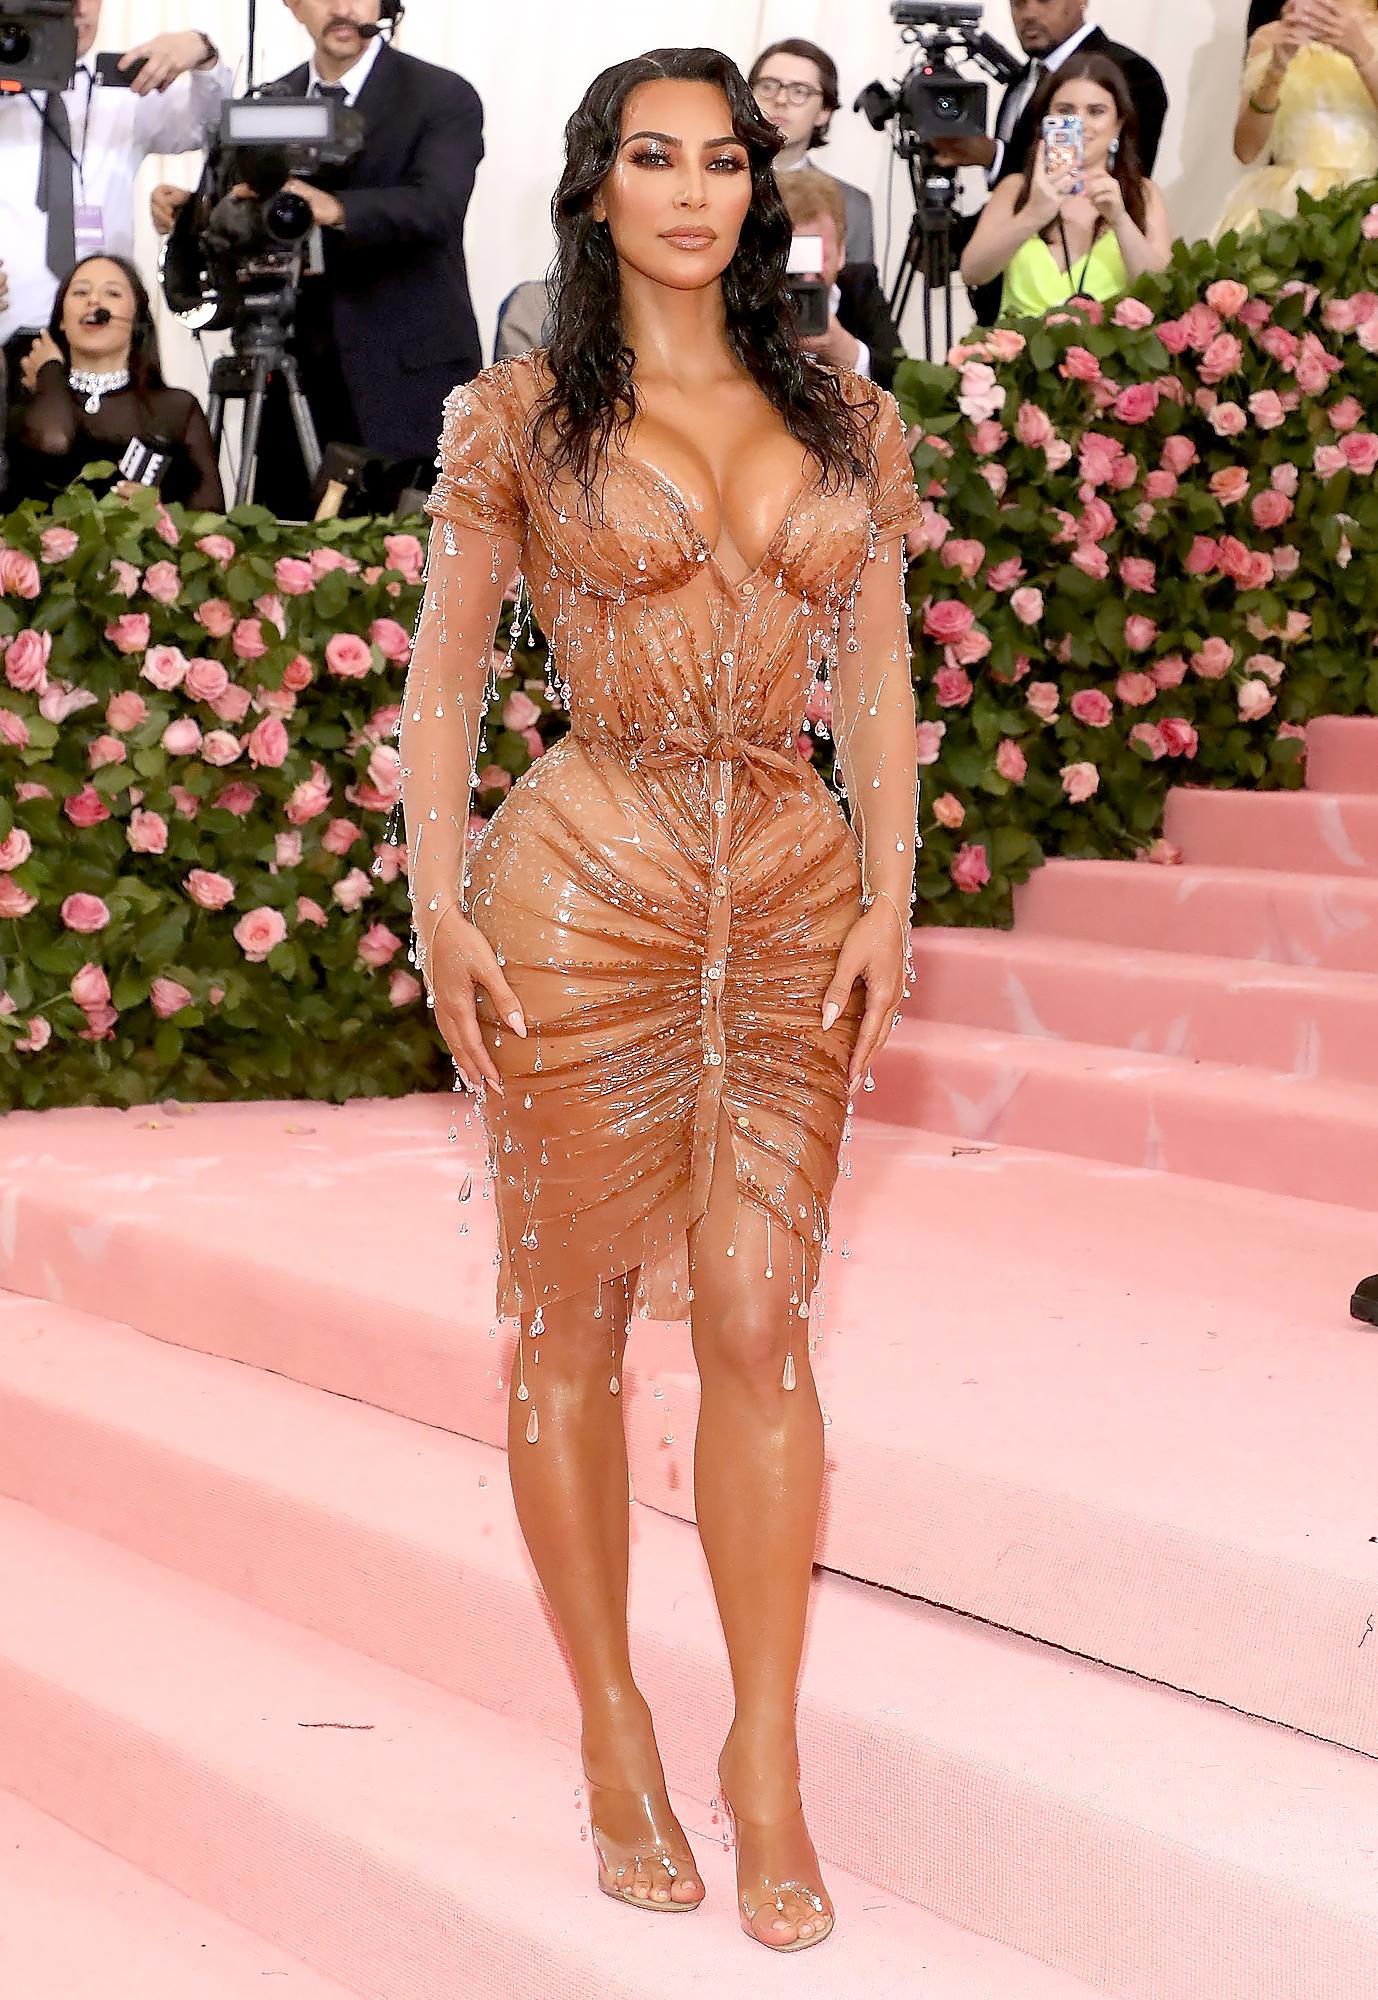 Kim Kardashian's Corset Breathing Lessons for Met Gala ...